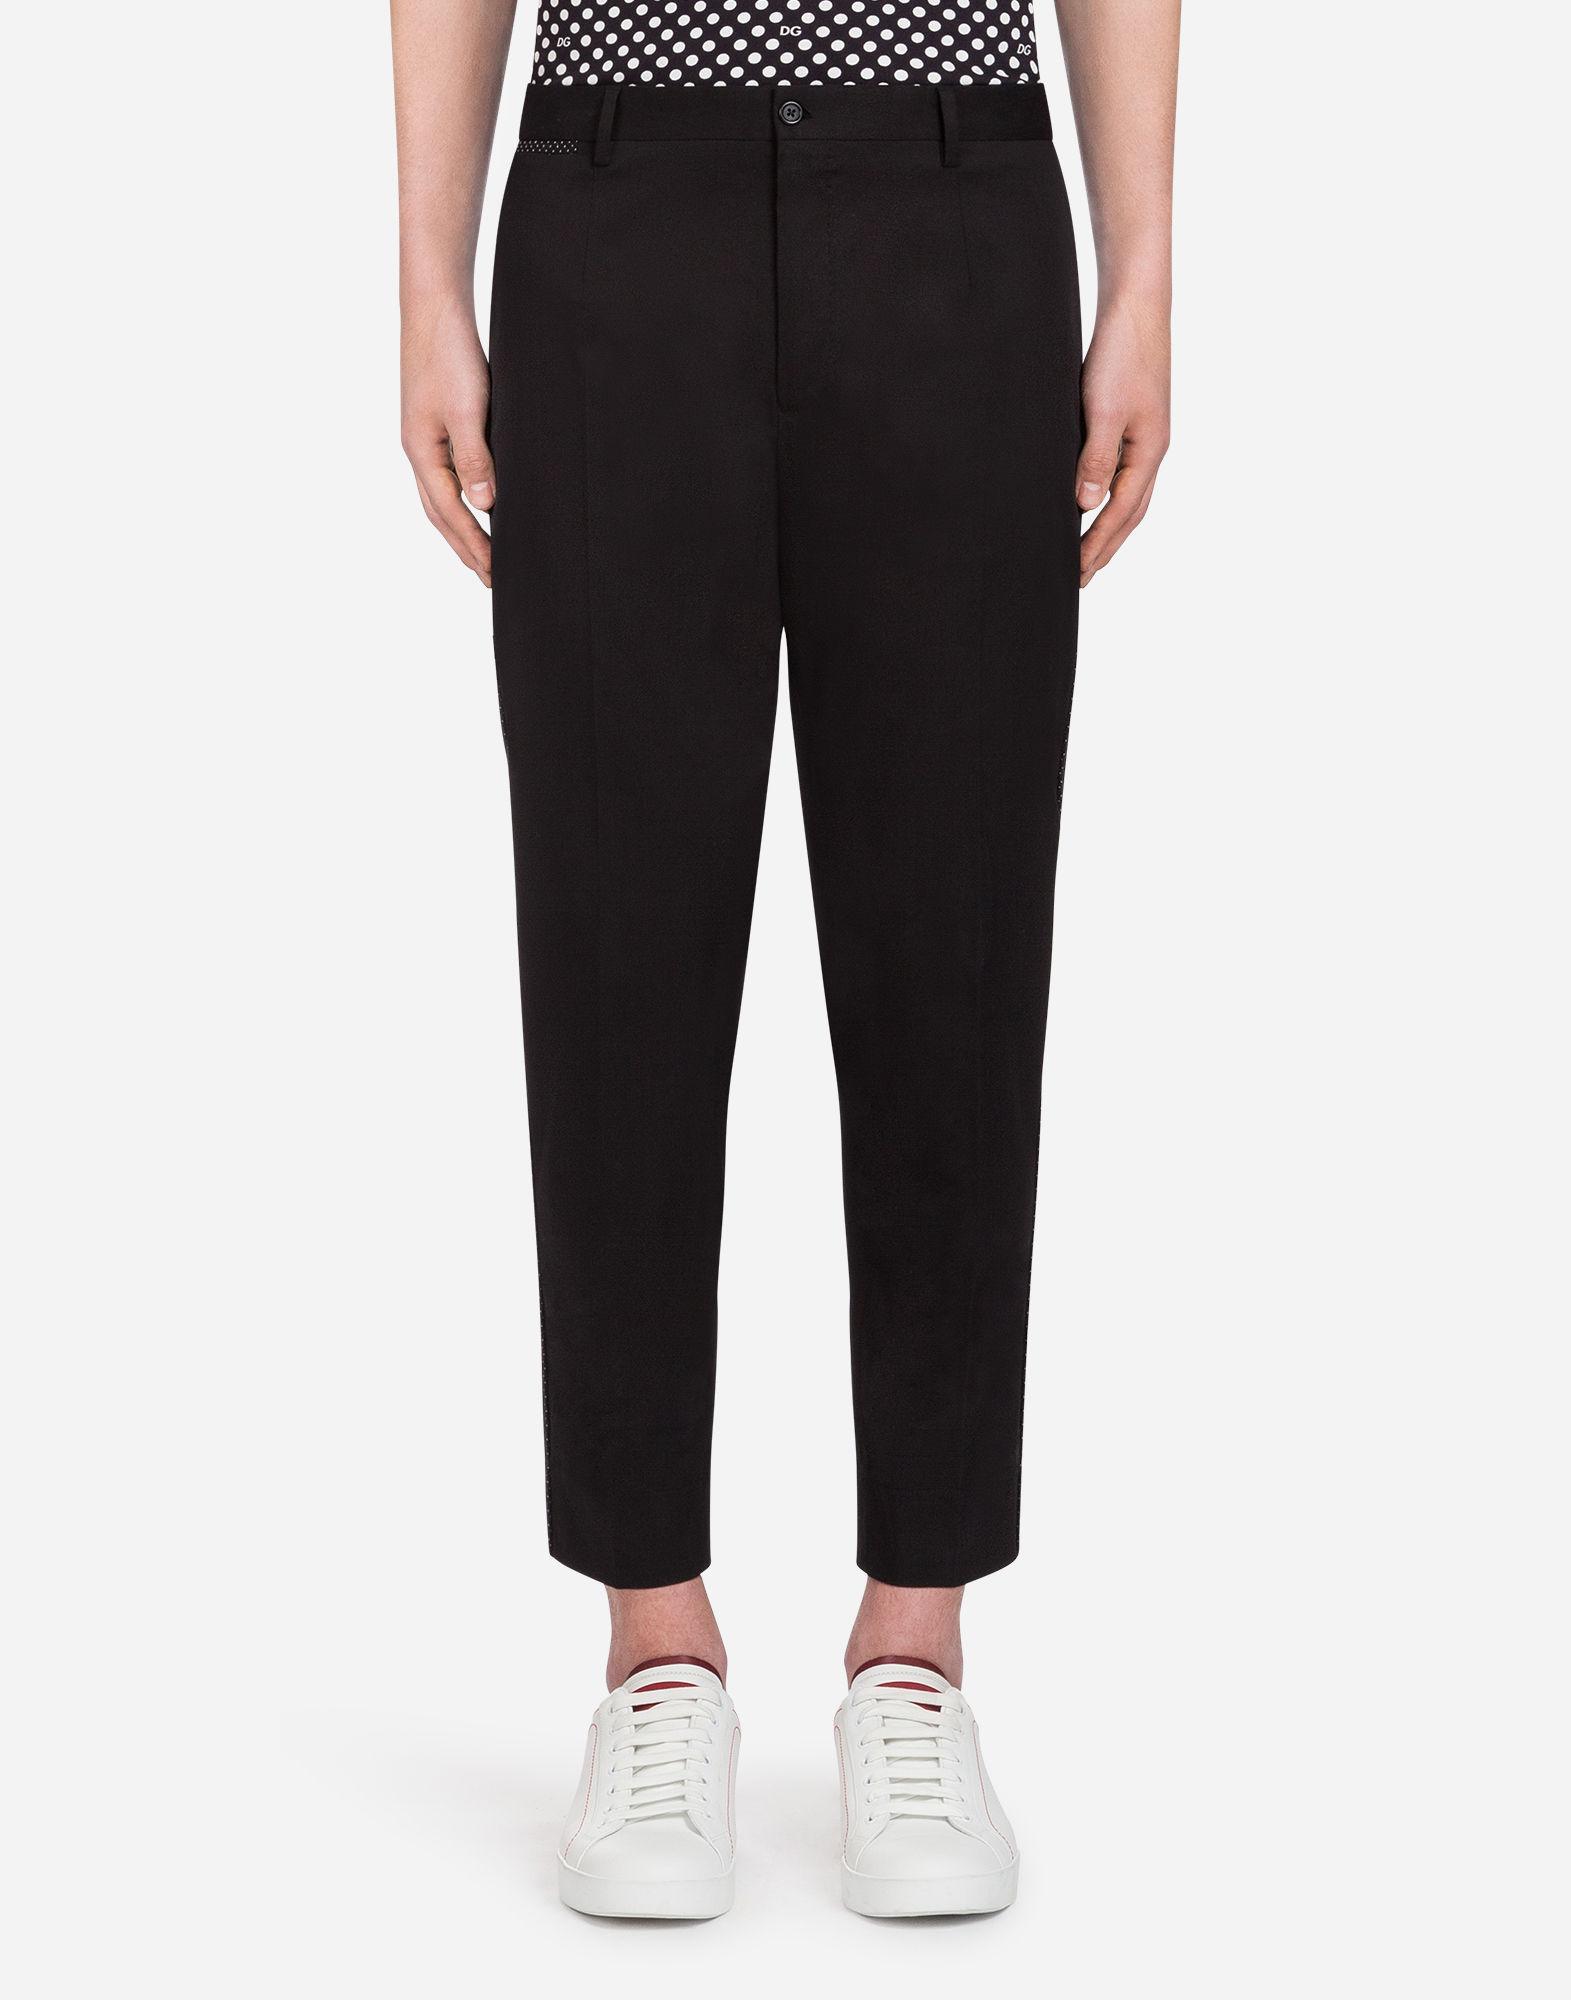 Dolce & Gabbana. Men's Black Stretch Cotton Trousers